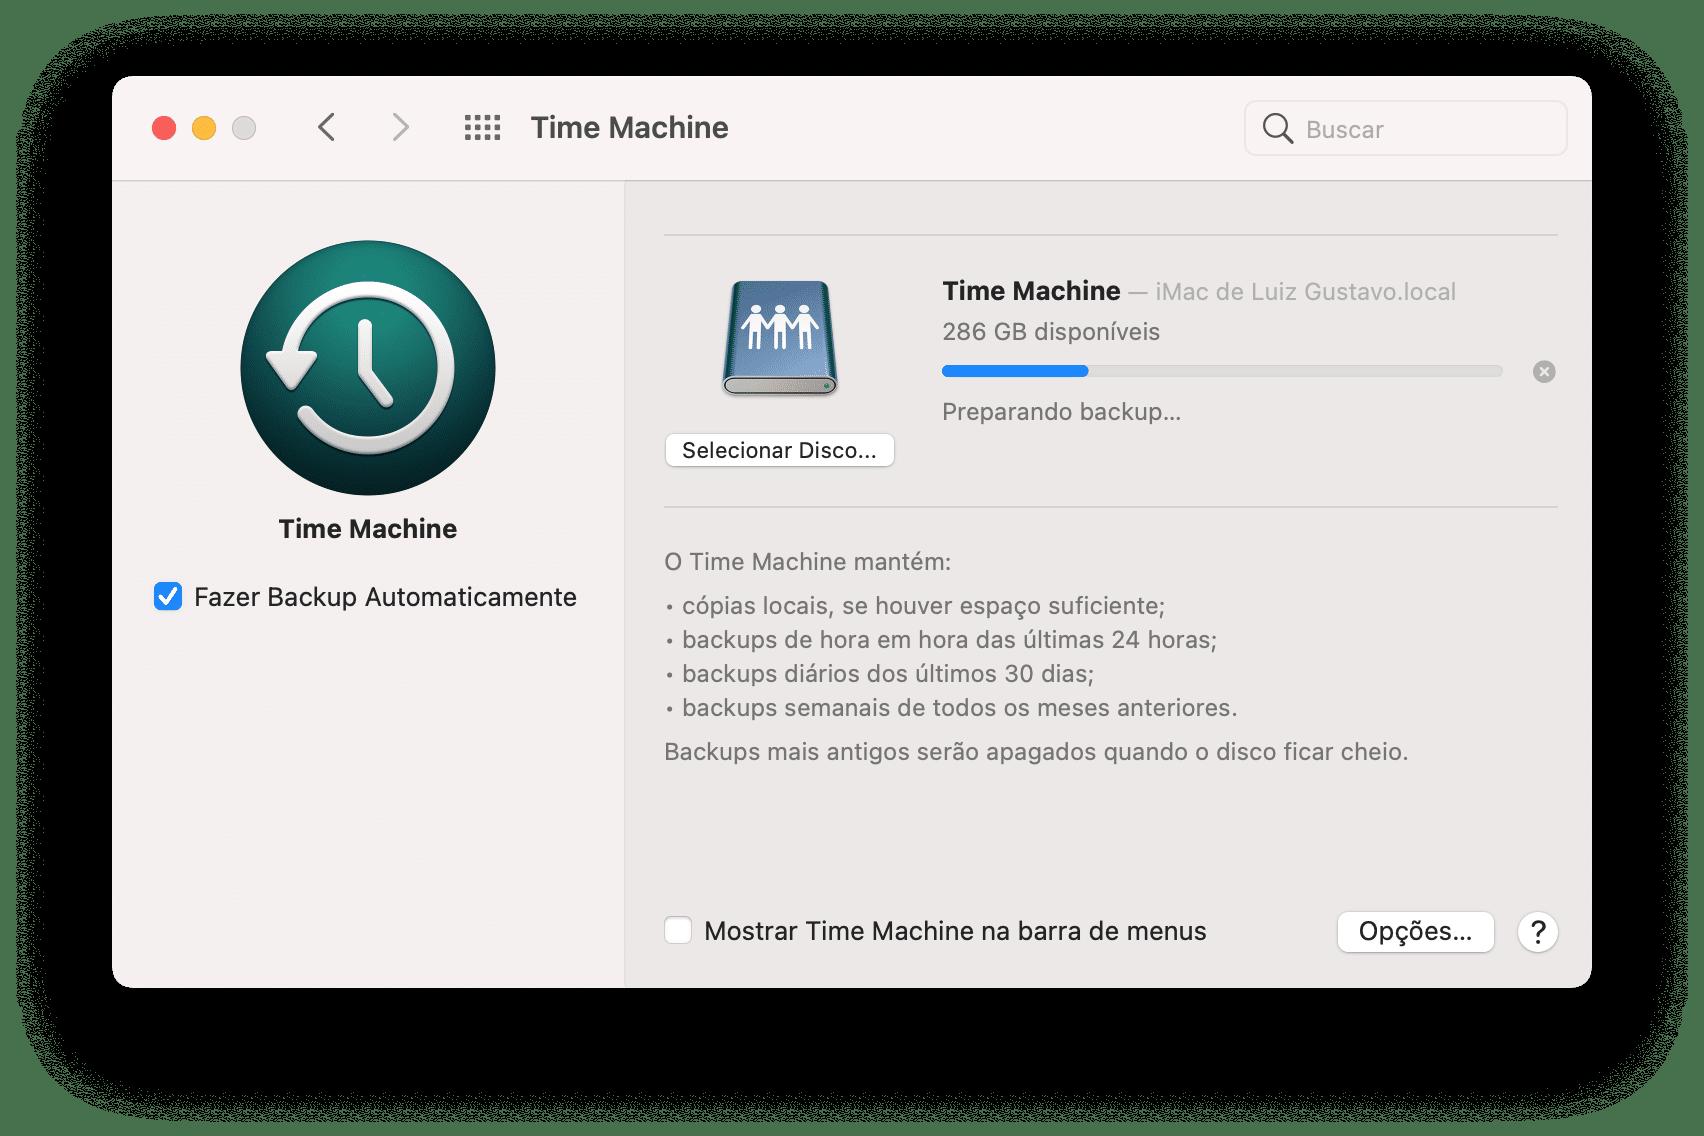 Backup do Time Machine